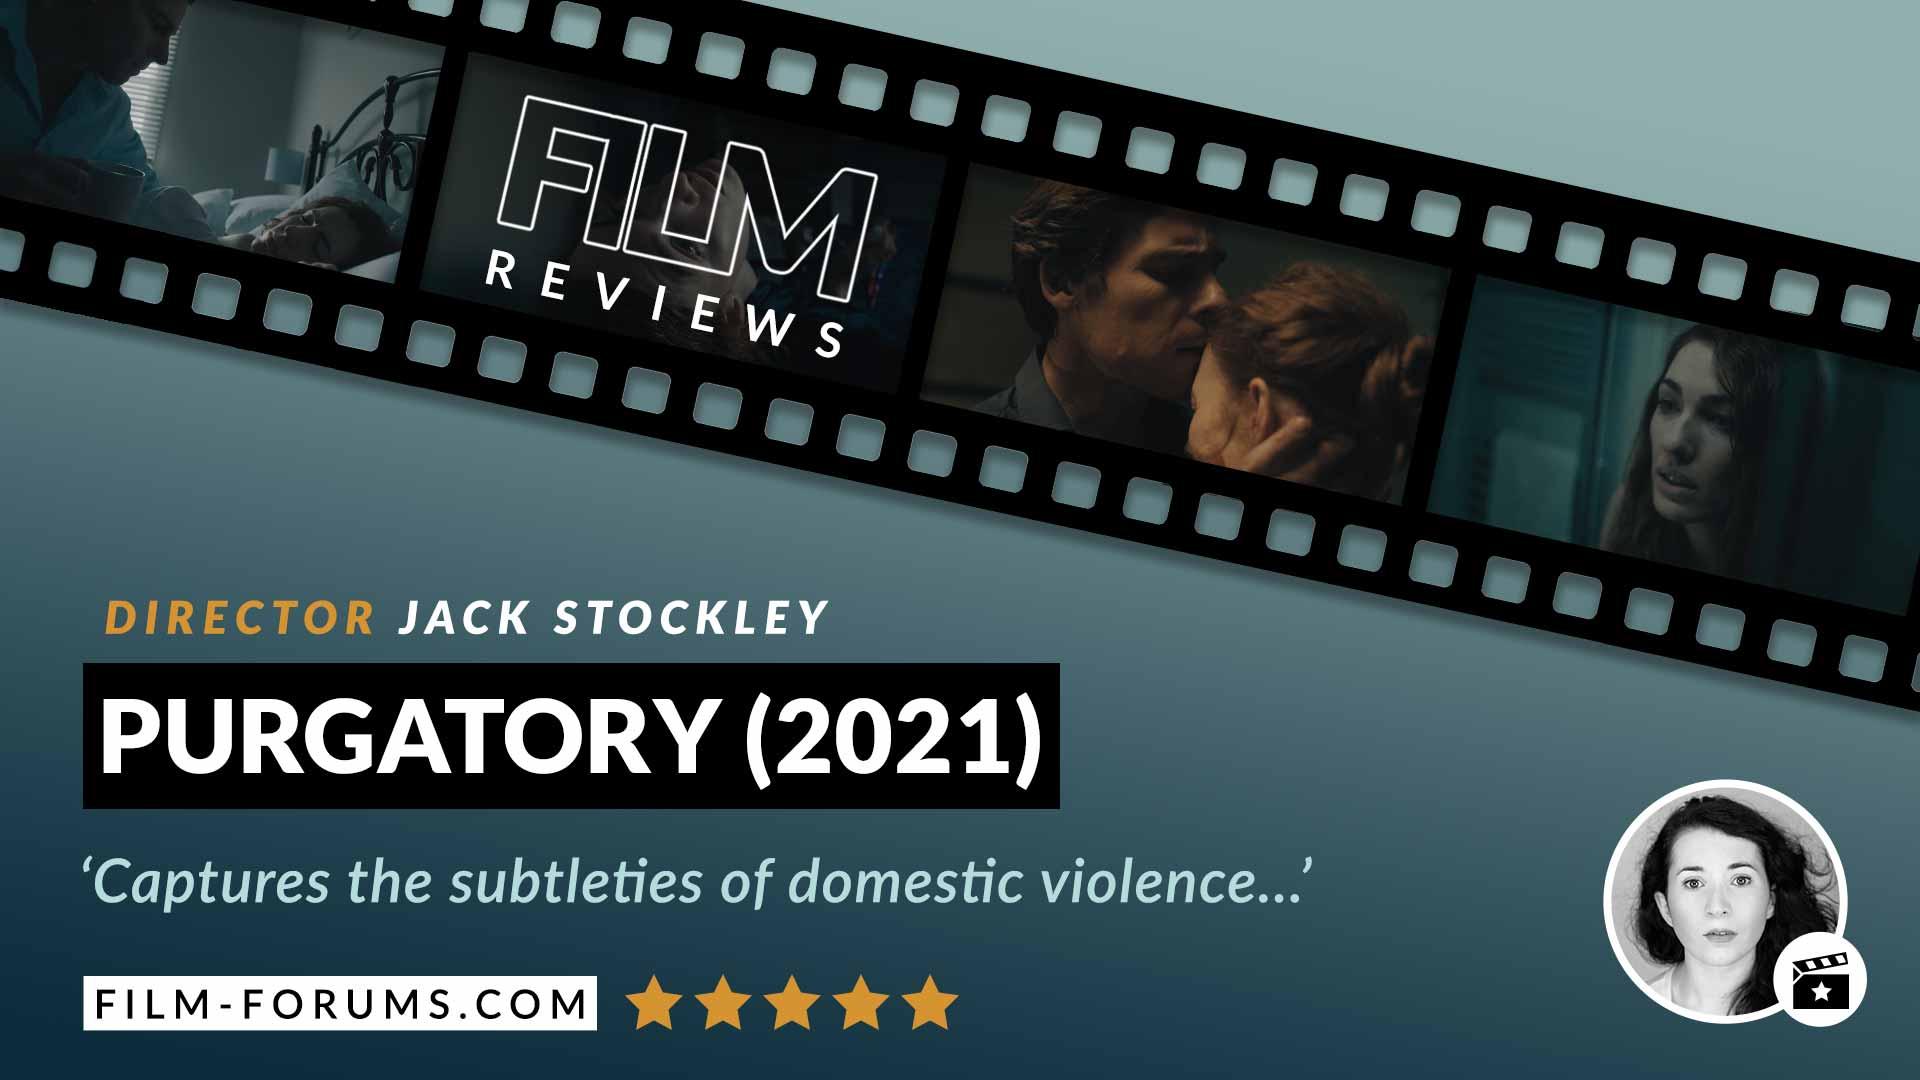 Purgatory (2021) Short Film Review